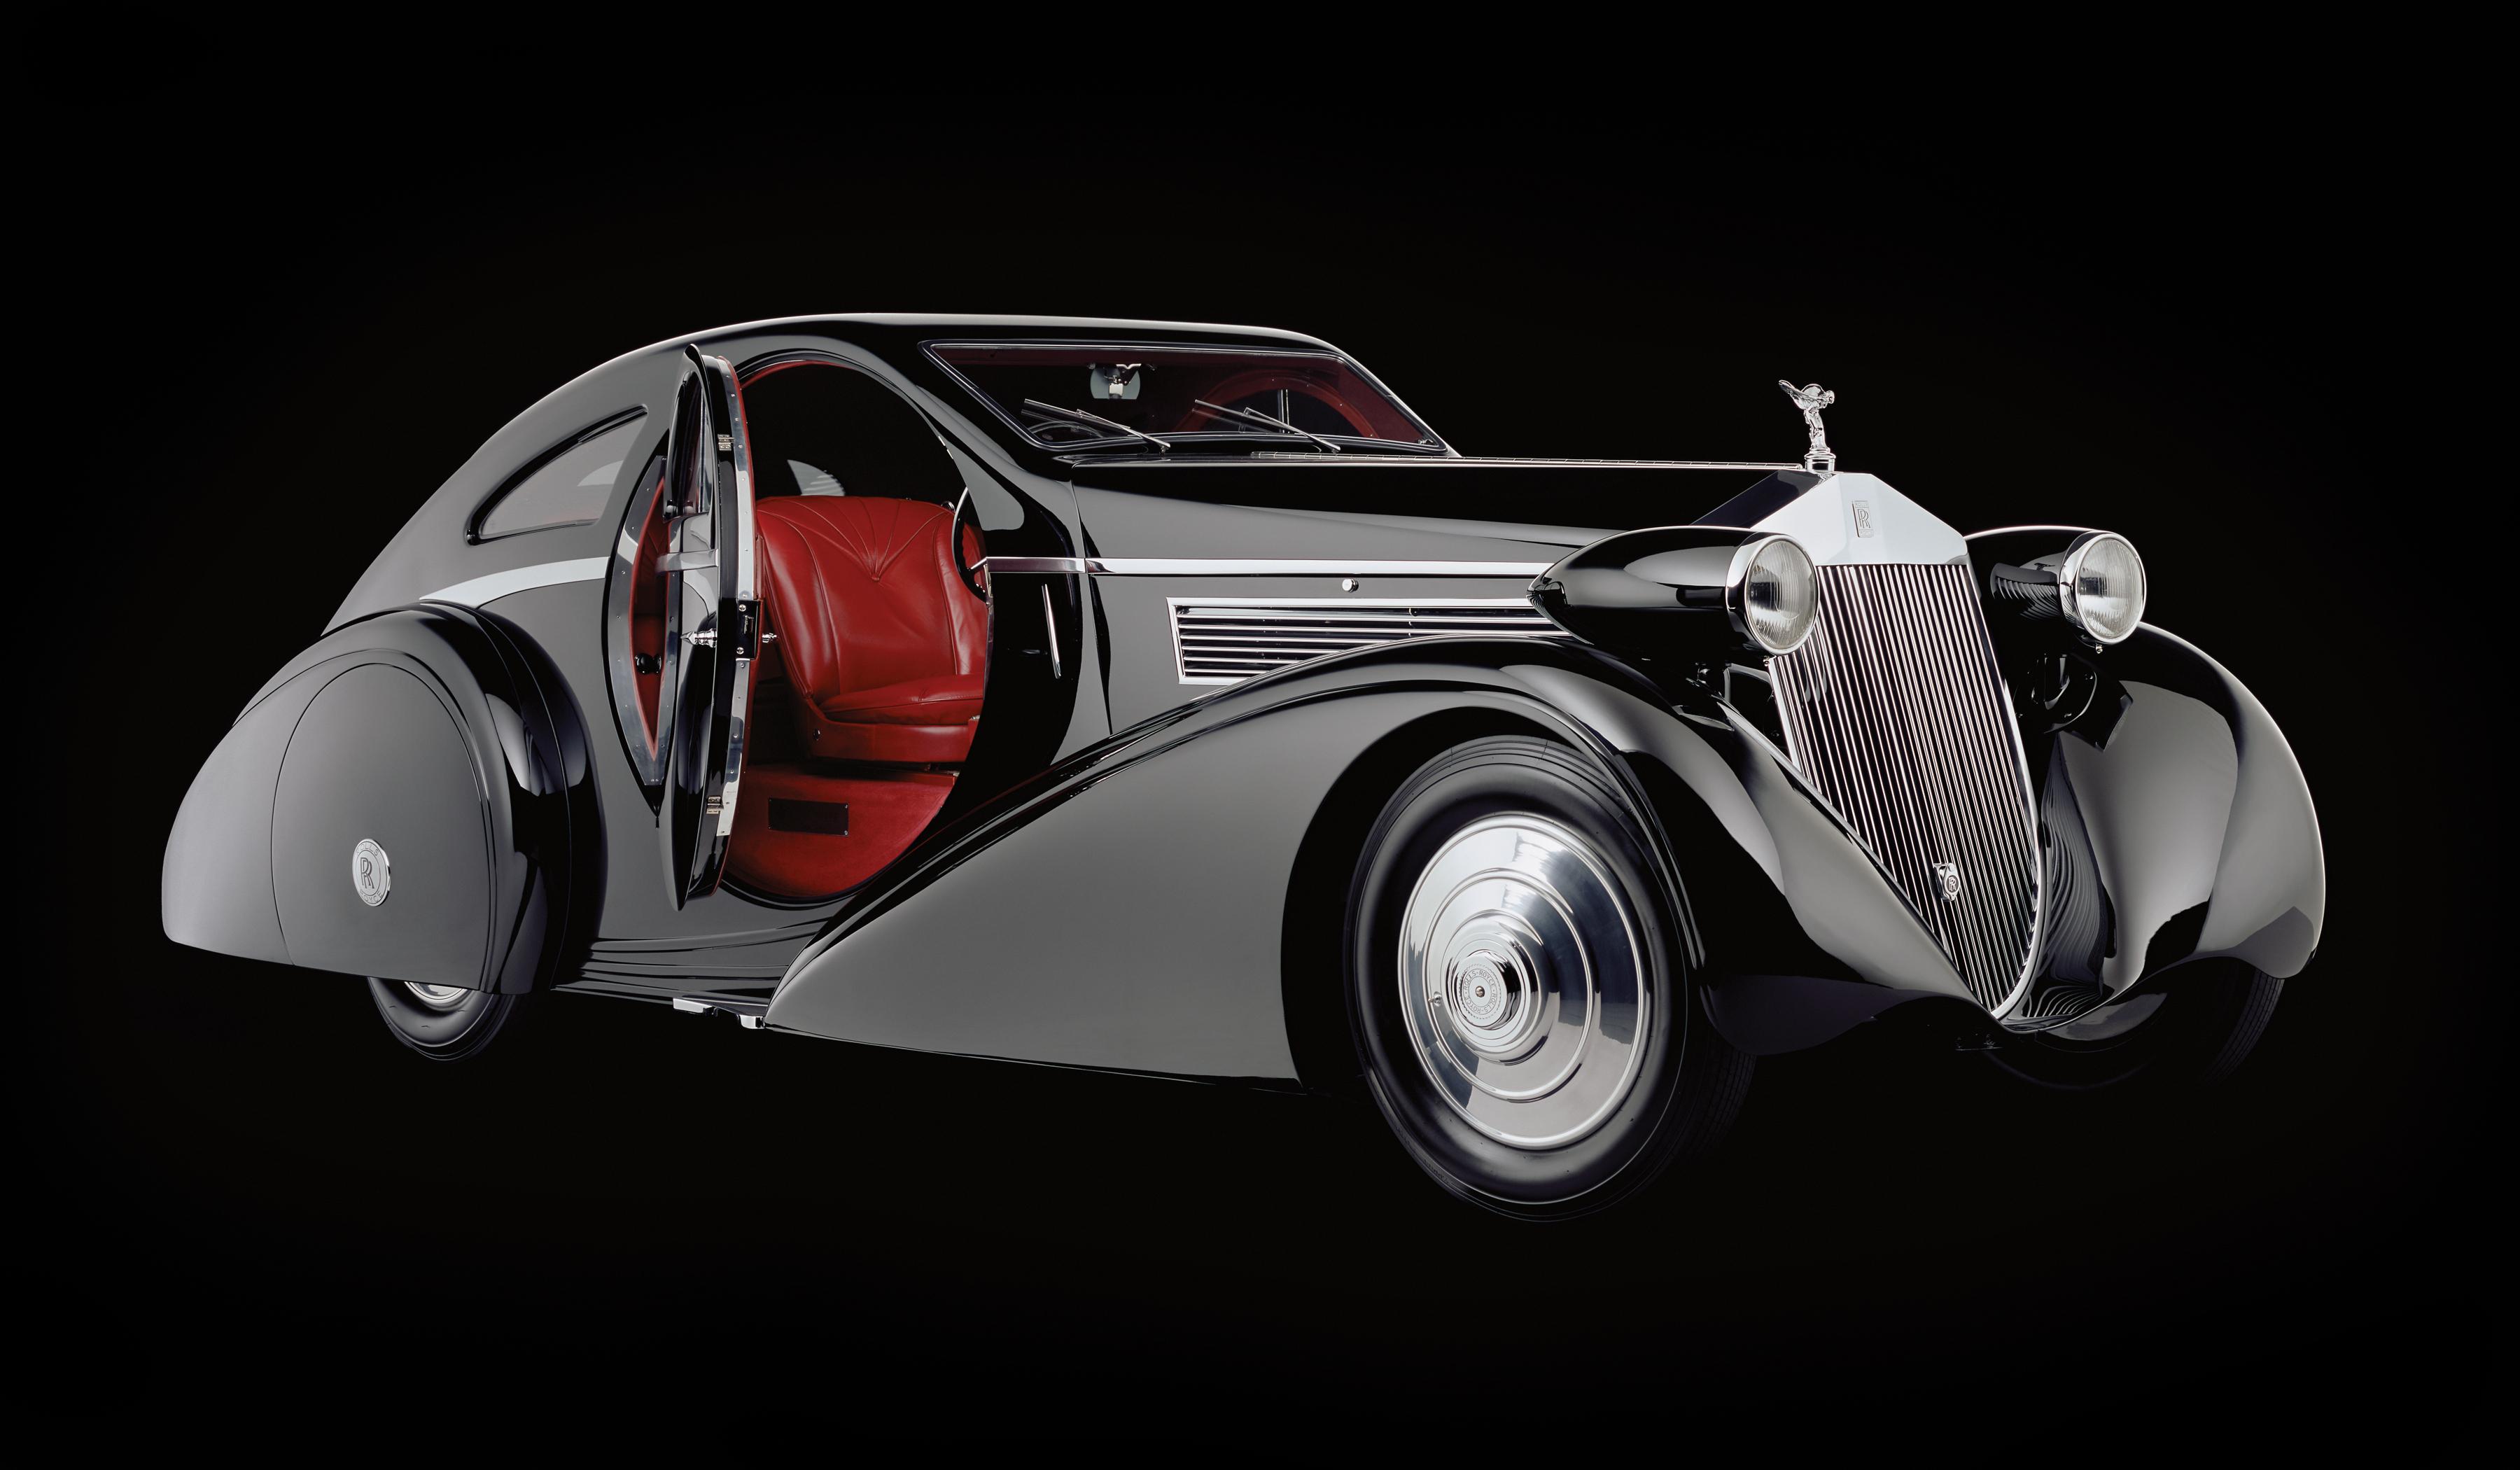 1925 Rolls-royce Phantom Backgrounds, Compatible - PC, Mobile, Gadgets| 3600x2100 px